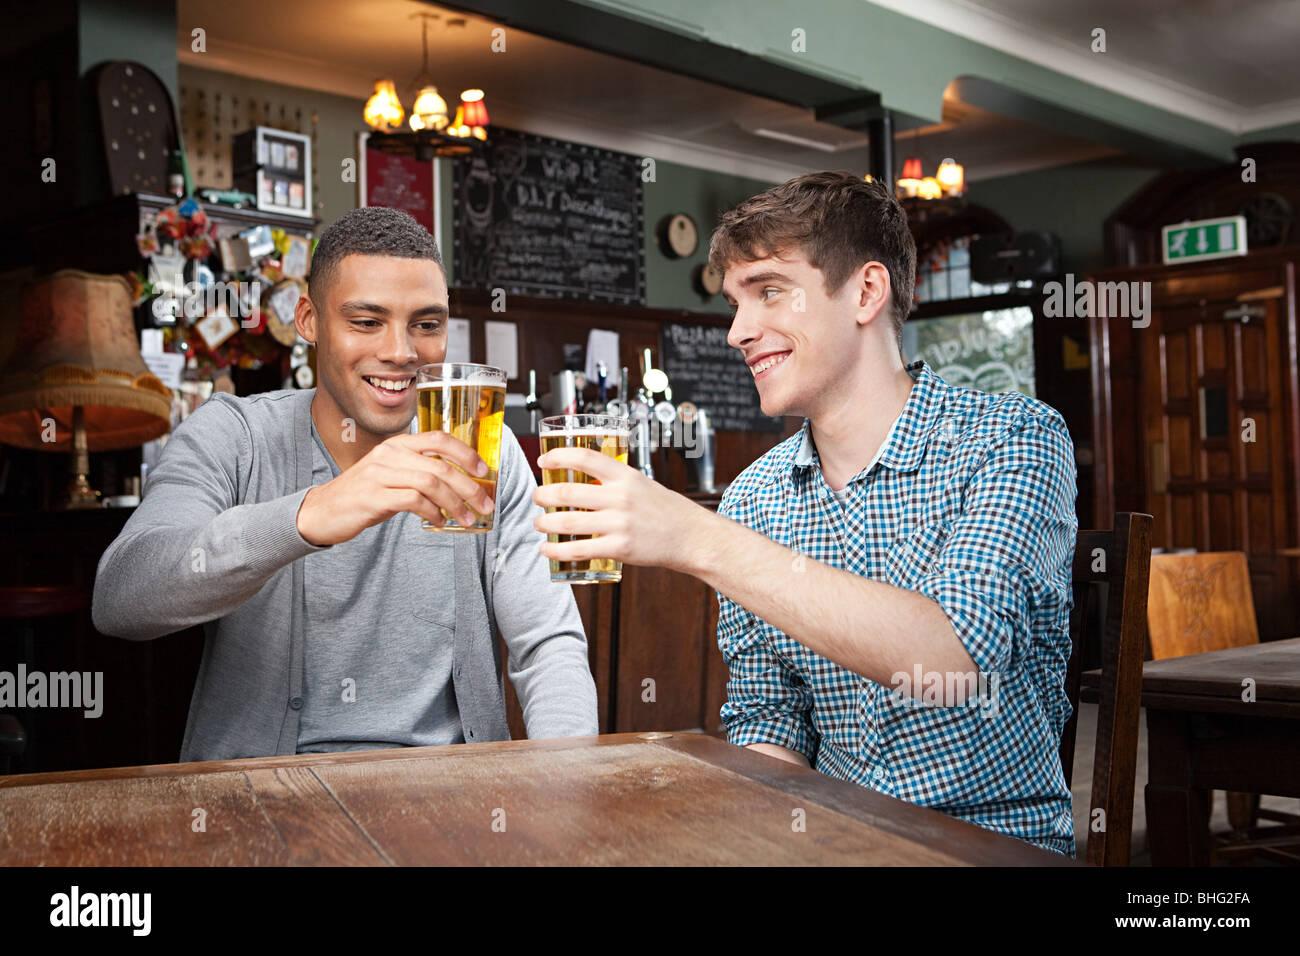 Junge Männer in der Bar Stockfoto